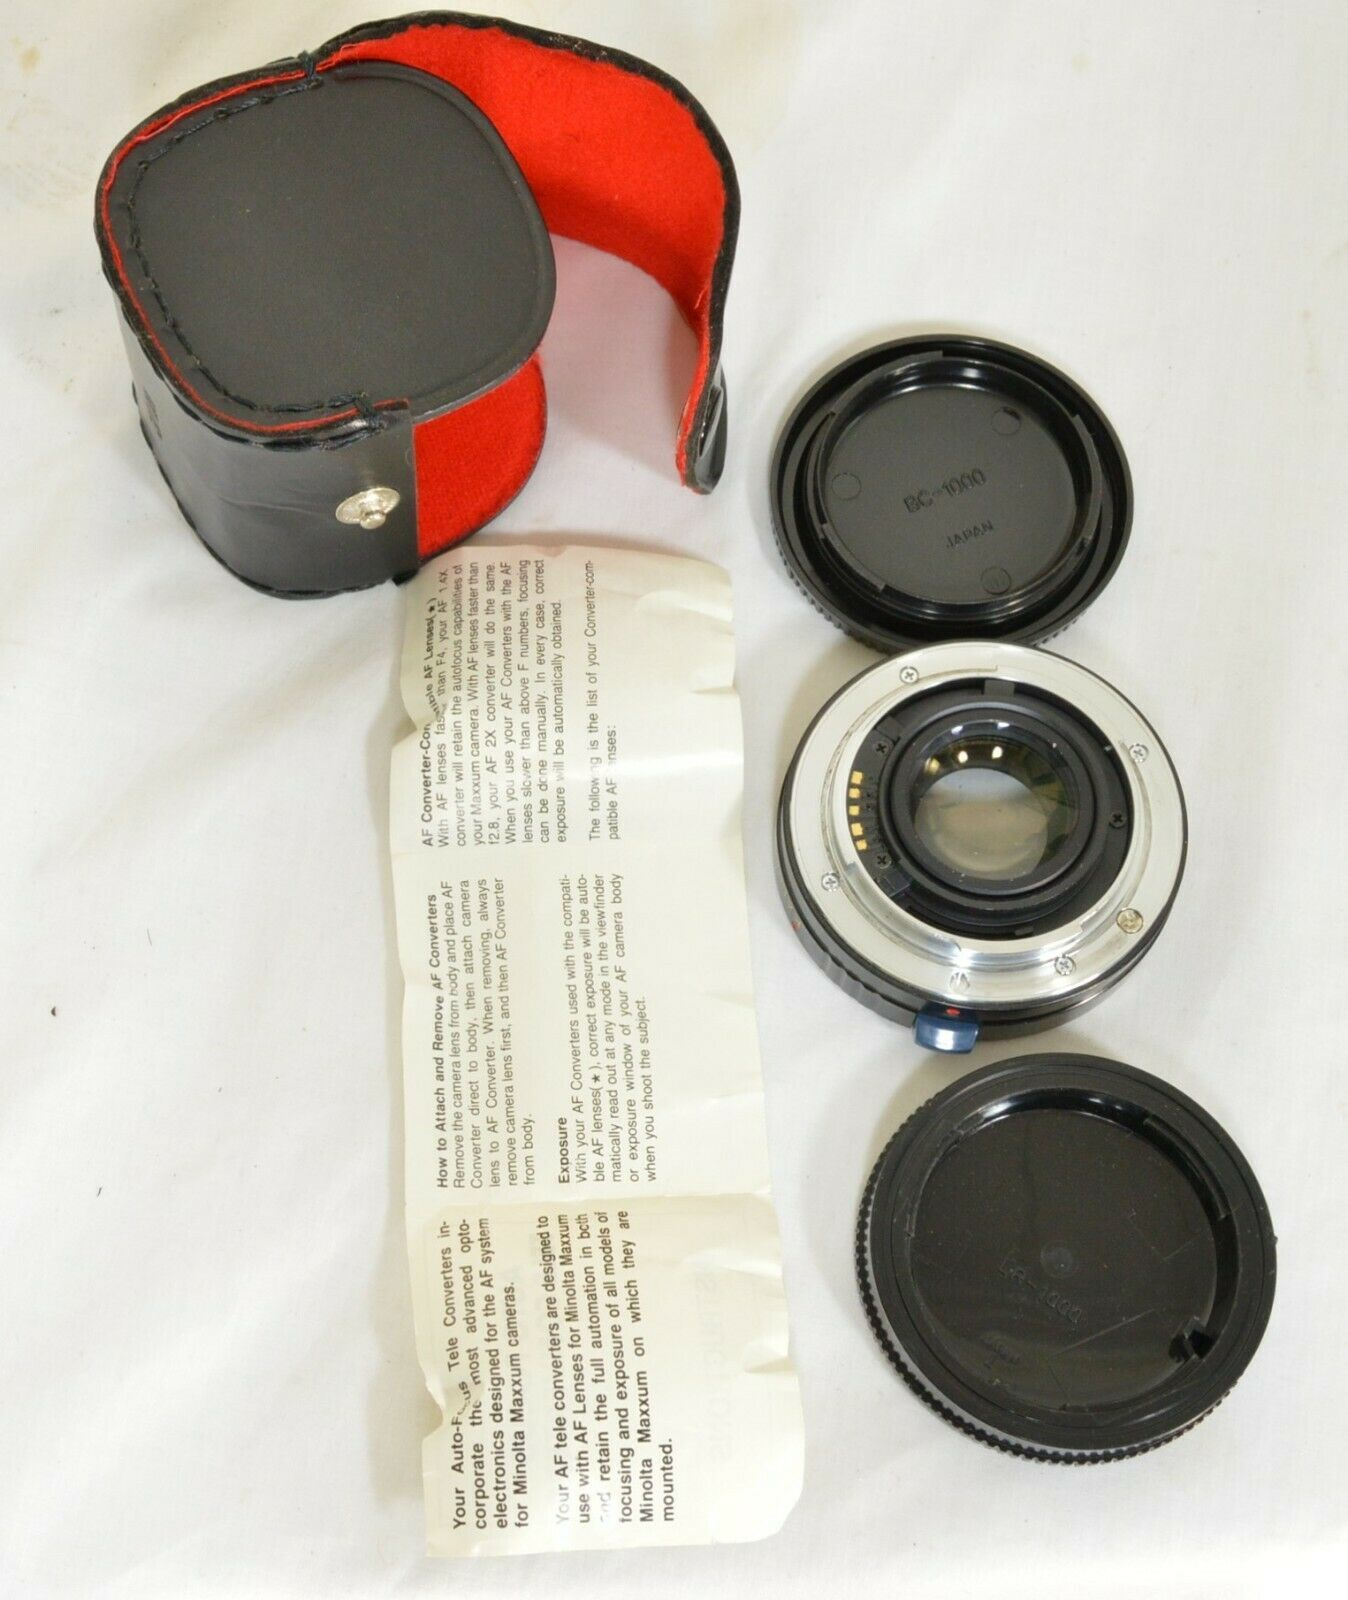 Kalimar 1.4 X M/AF Tele Converter Auto Focus camera lens w/ case & instructions image 3